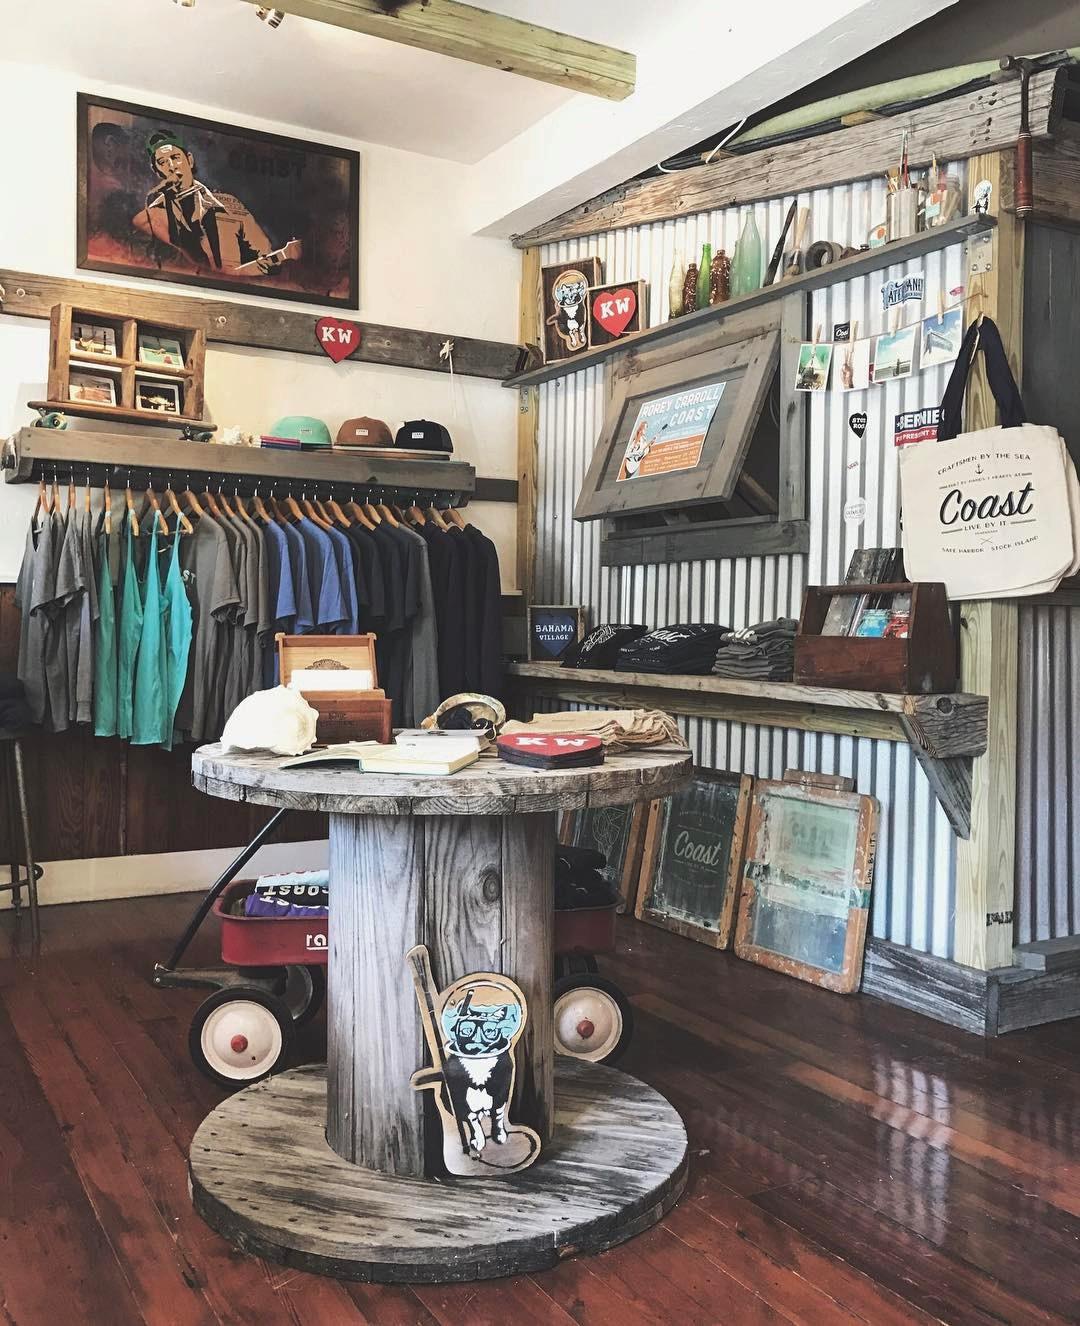 Inside the Coast store.